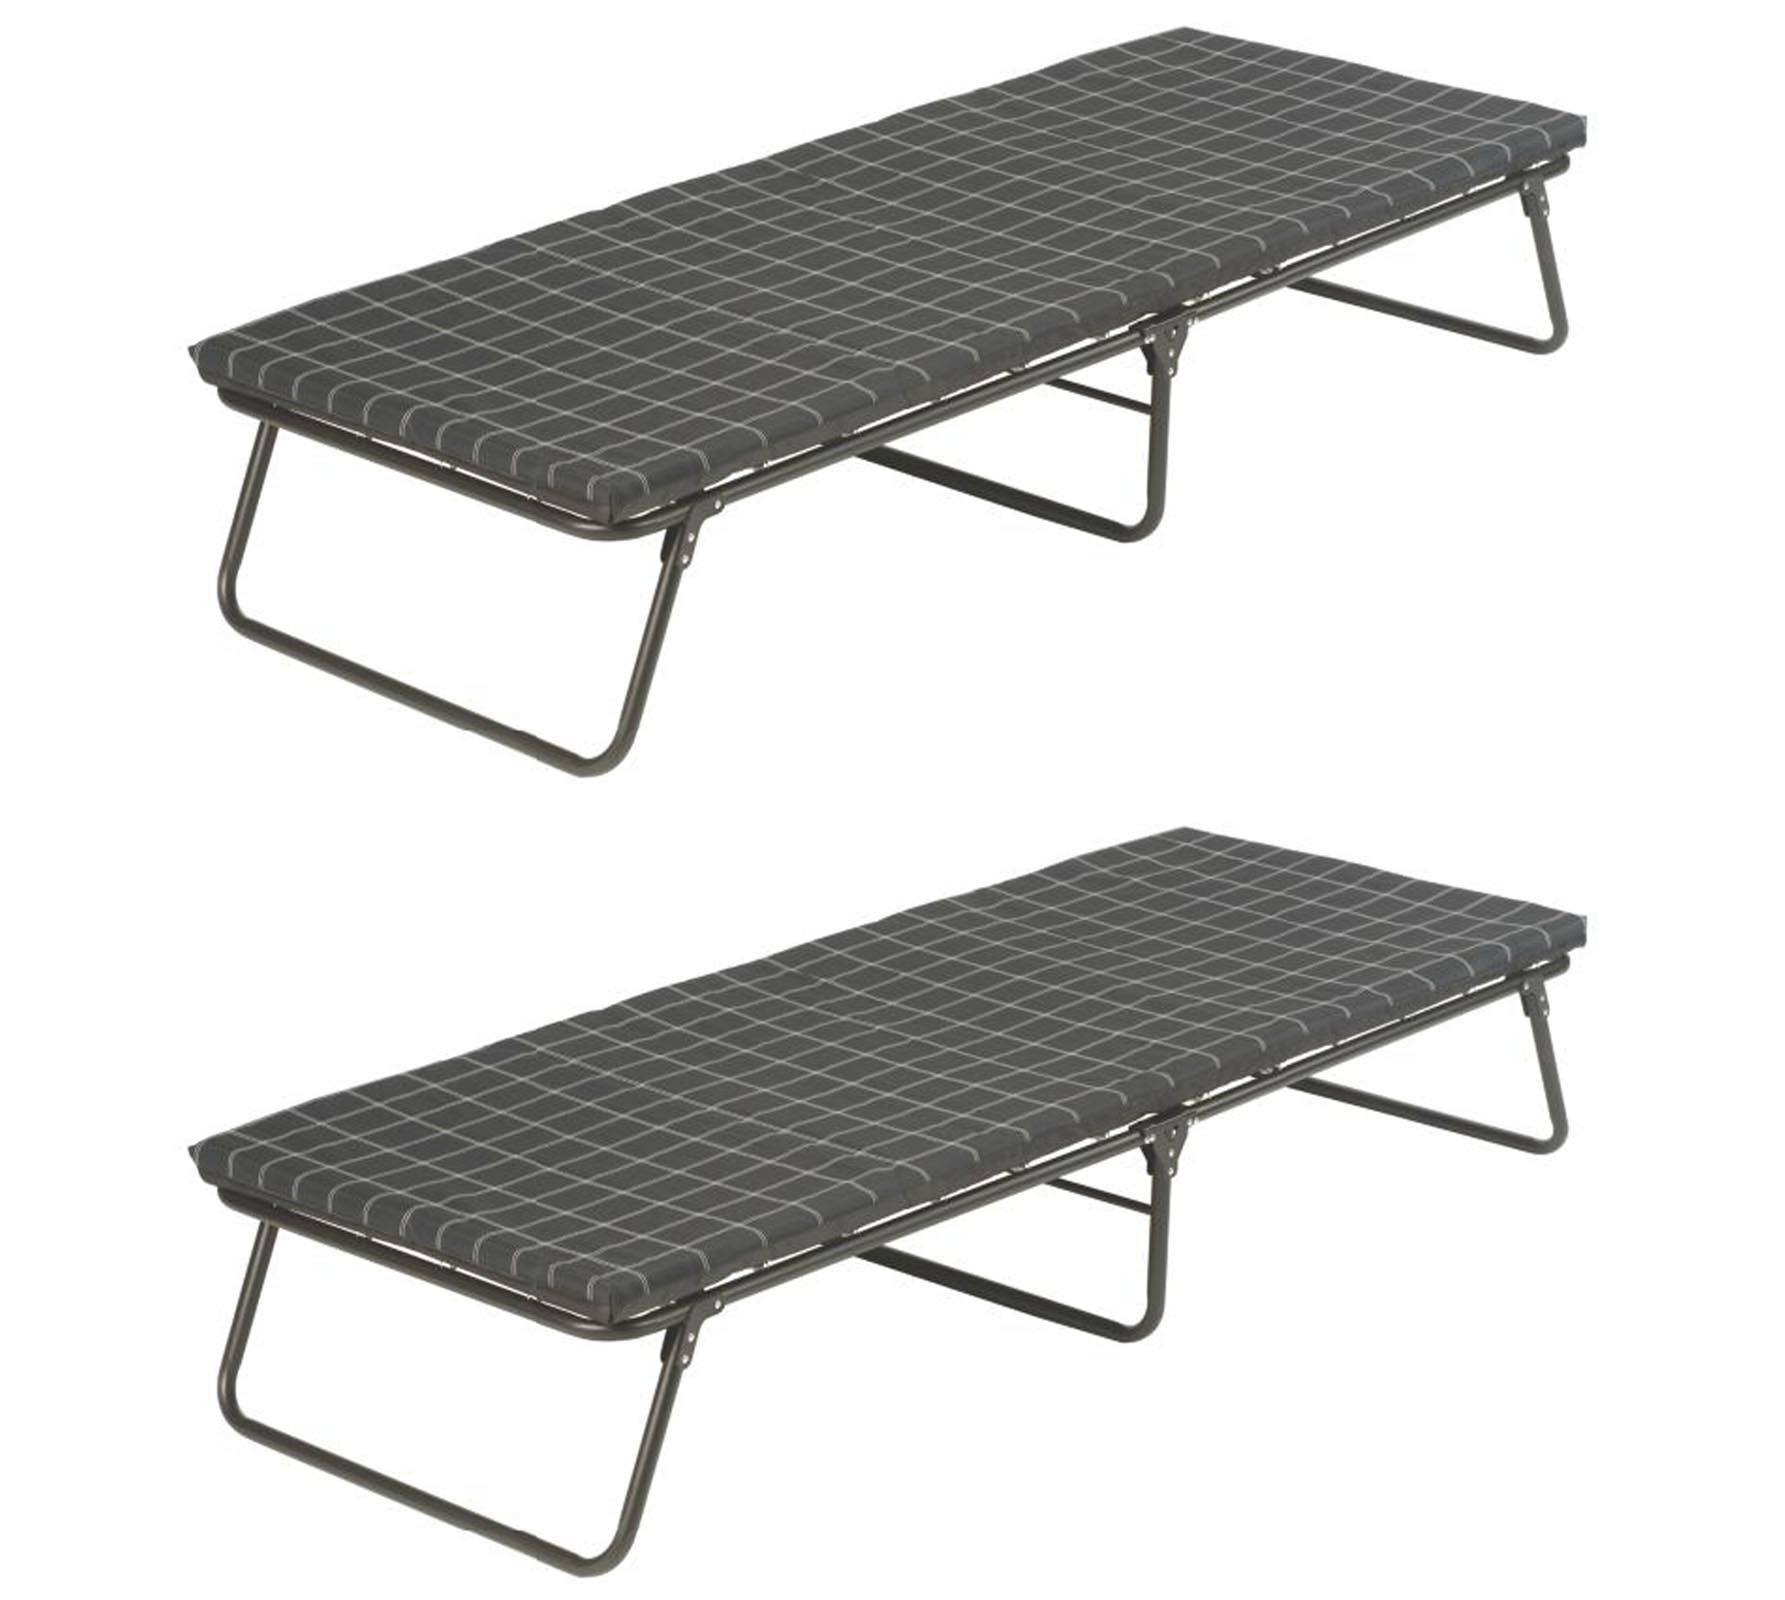 "(2) COLEMAN Portable ComfortSmart Steel Frame Deluxe Camping Cots | 30"" x 80"""